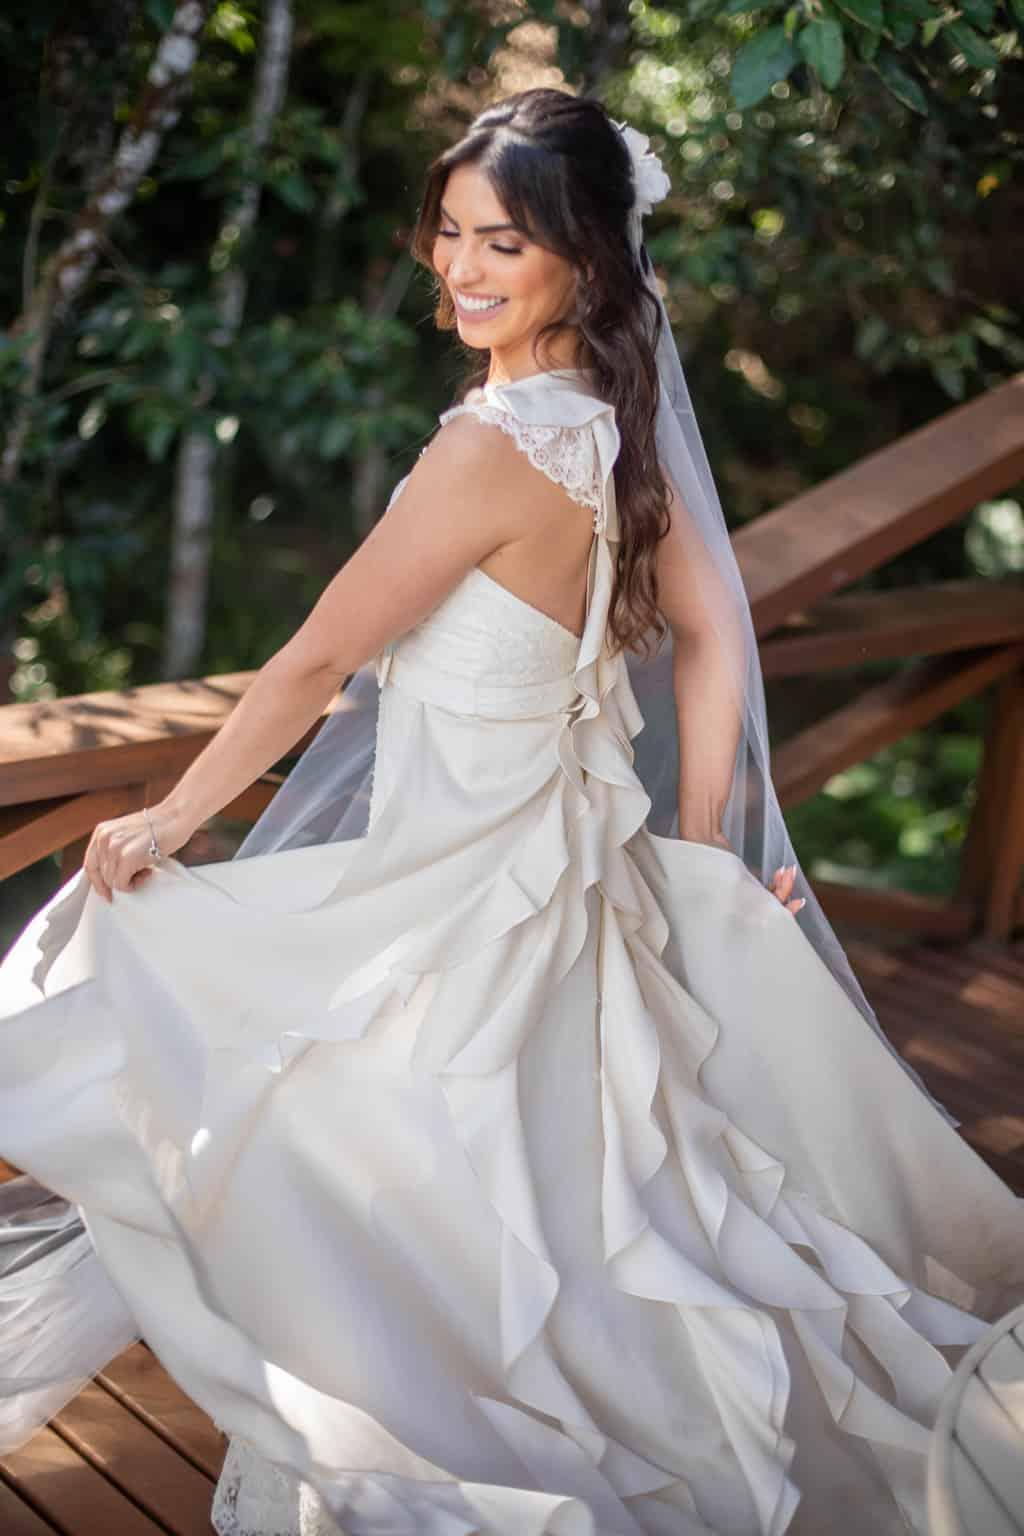 beleza-da-noiva-Casamento-Juliana-e-Sebastian-making-of-Pousada-La-Belle-Bruna-vestido-de-noiva107